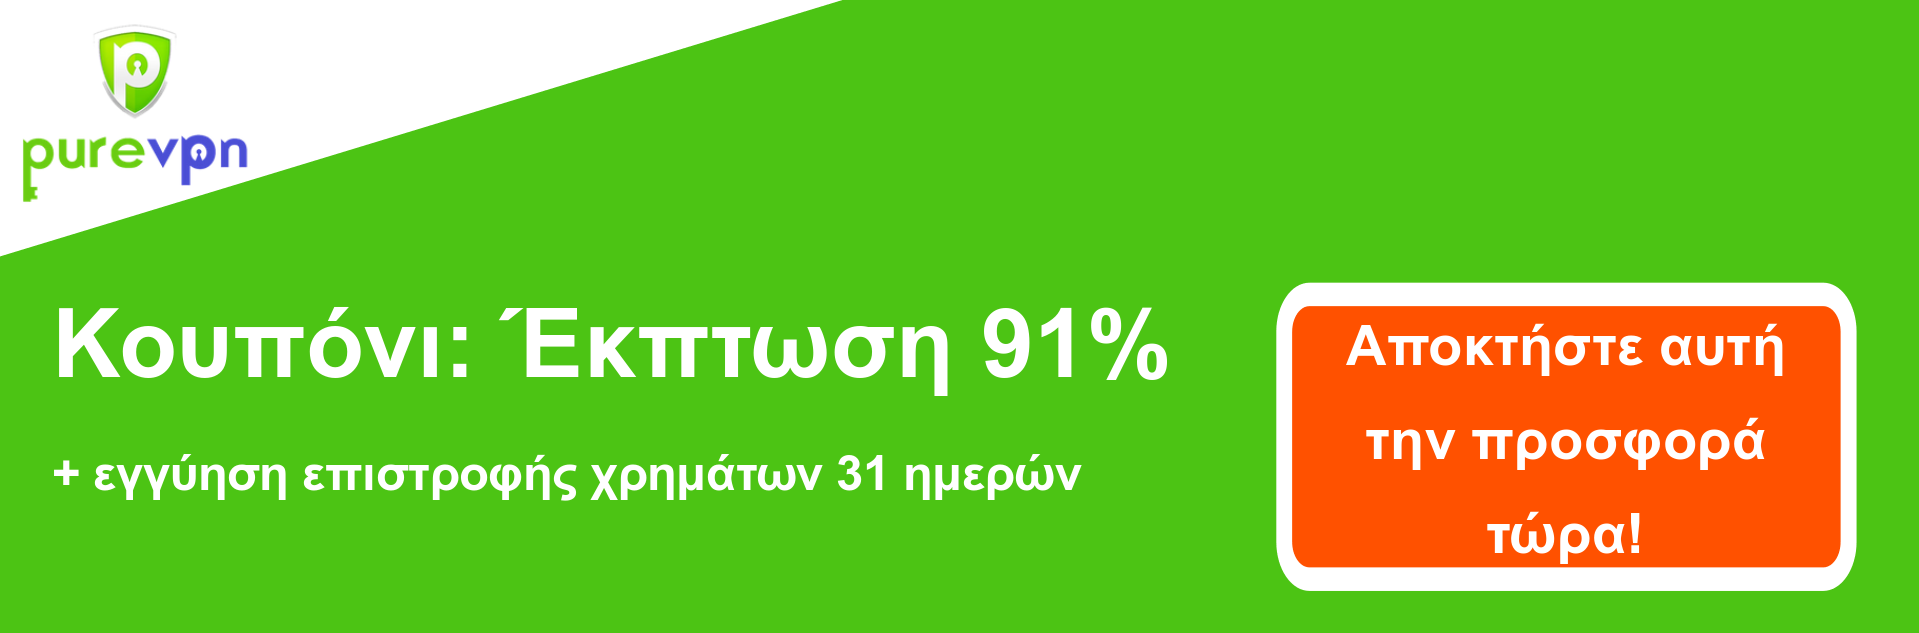 Banner κουπονιού PureVPN - Έκπτωση 91%